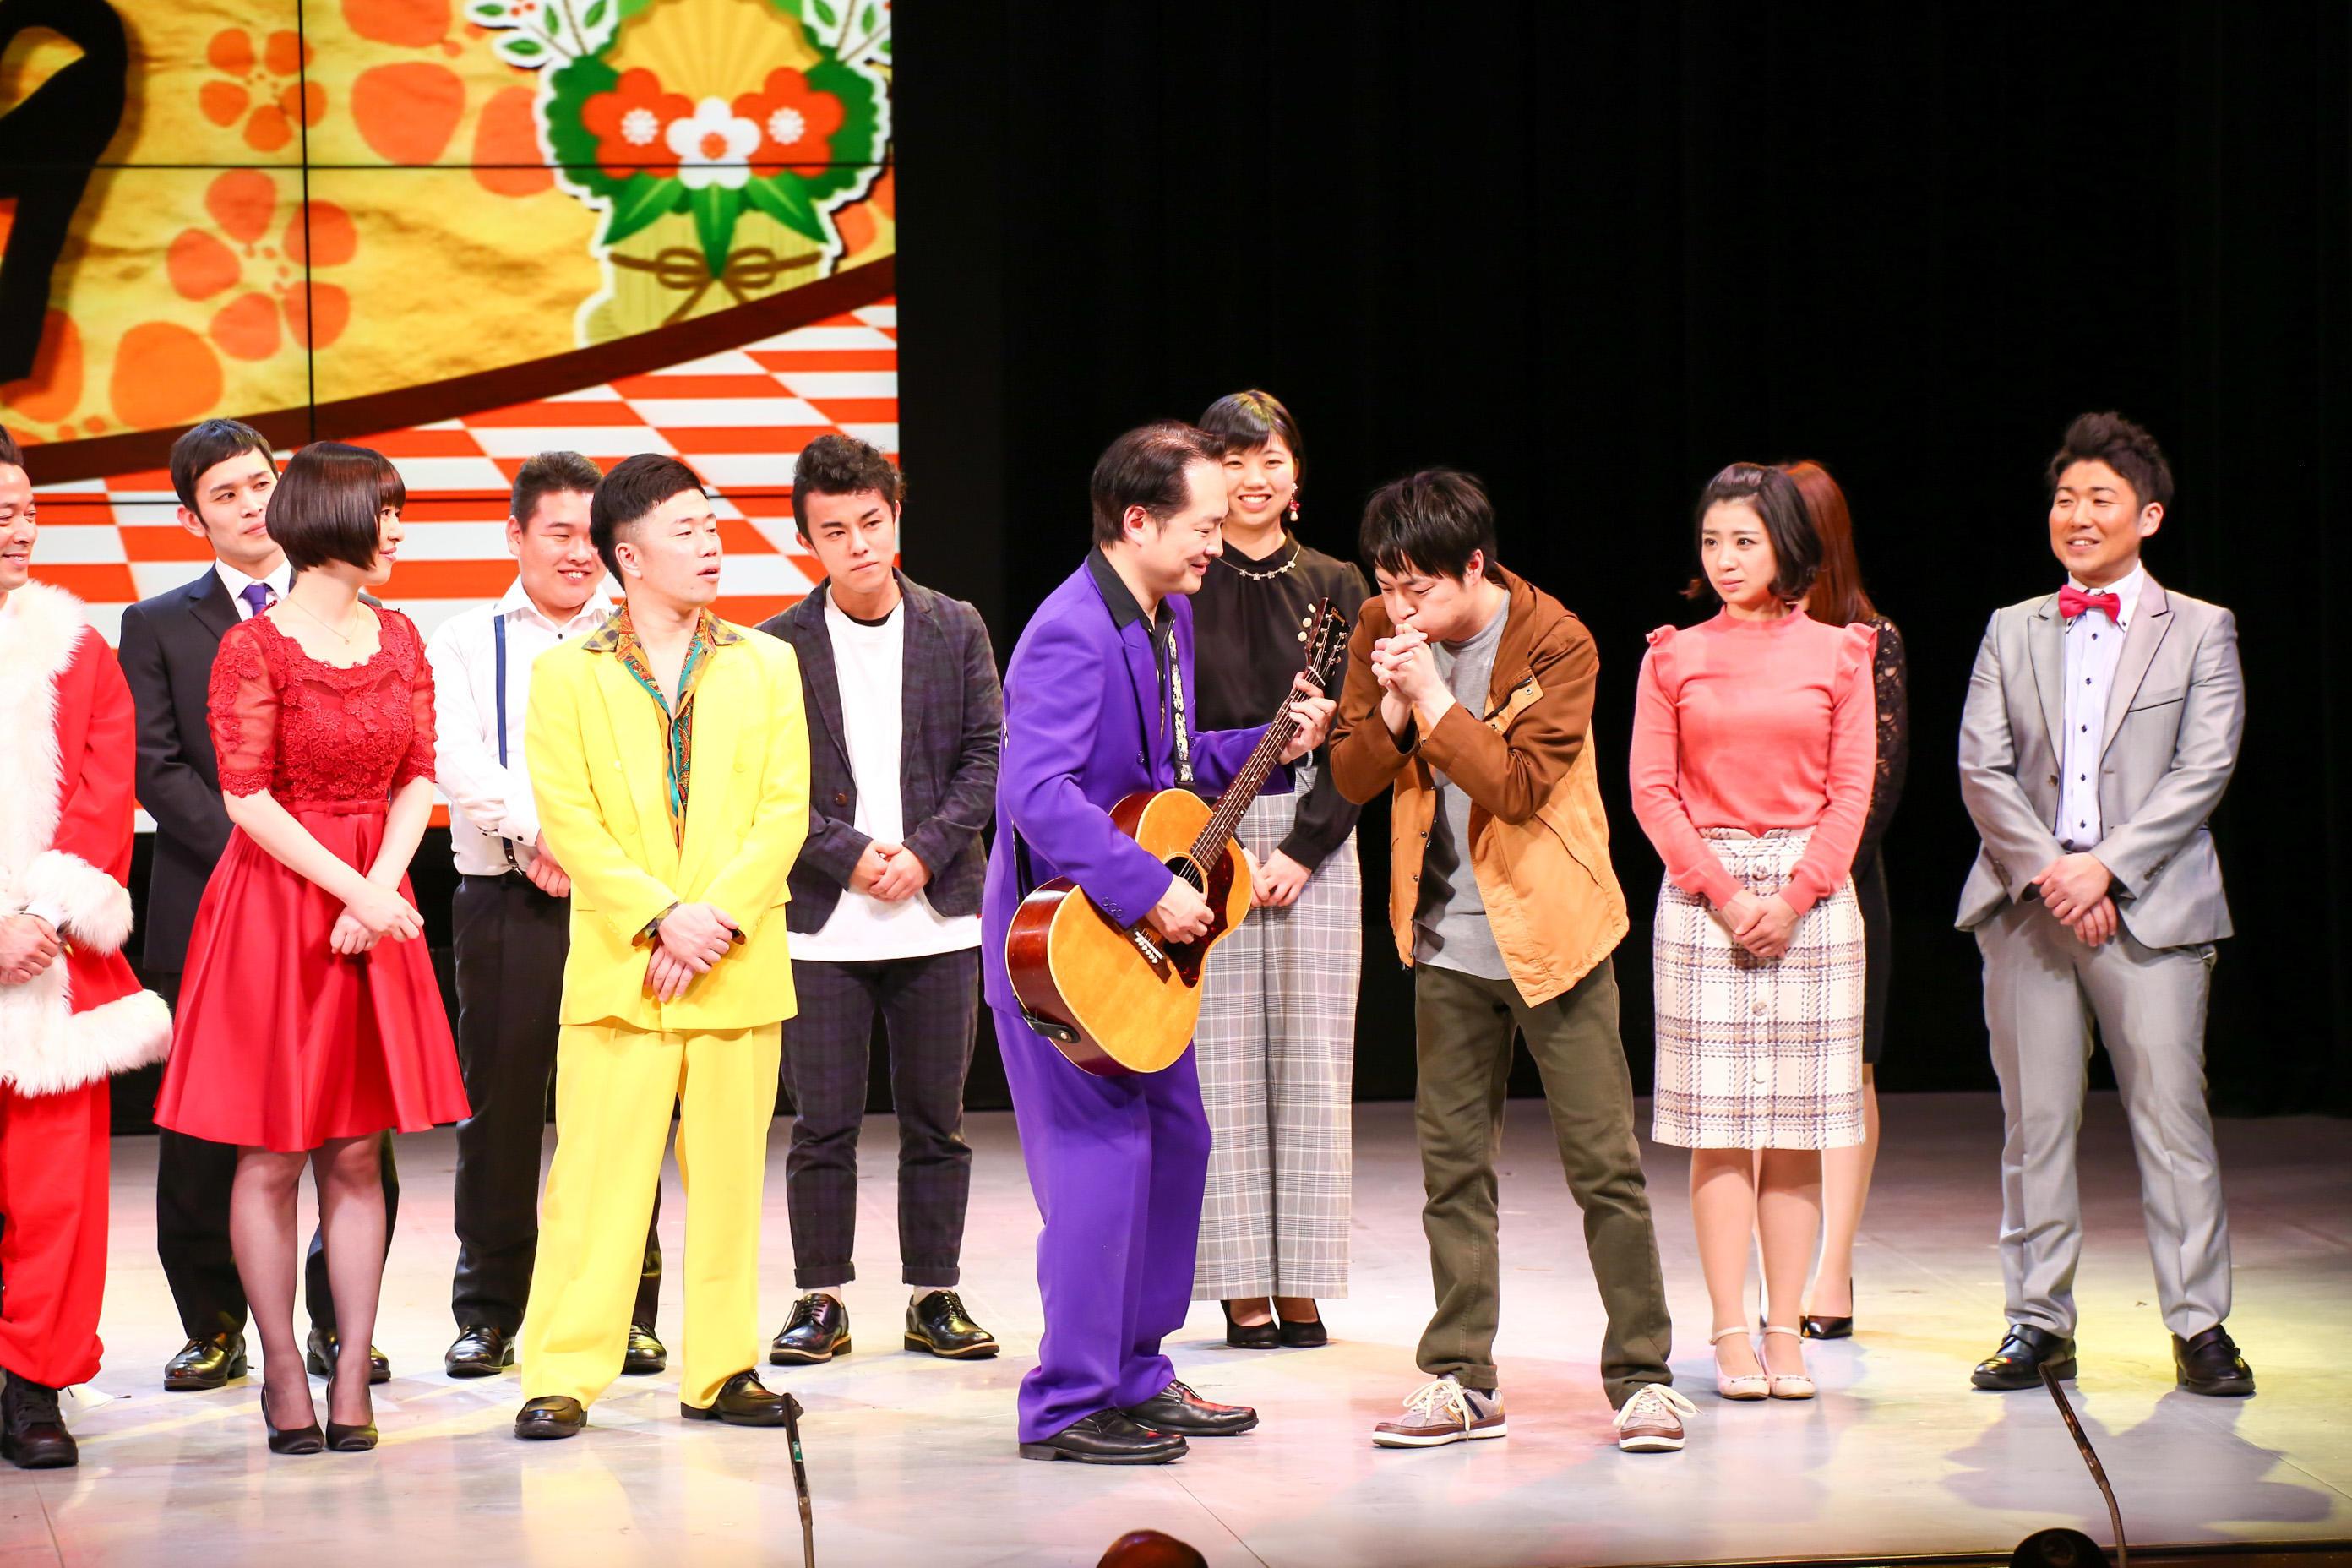 http://news.yoshimoto.co.jp/20190101033727-102ea386134beb232bc4b68551598d01cd115e6b.jpg